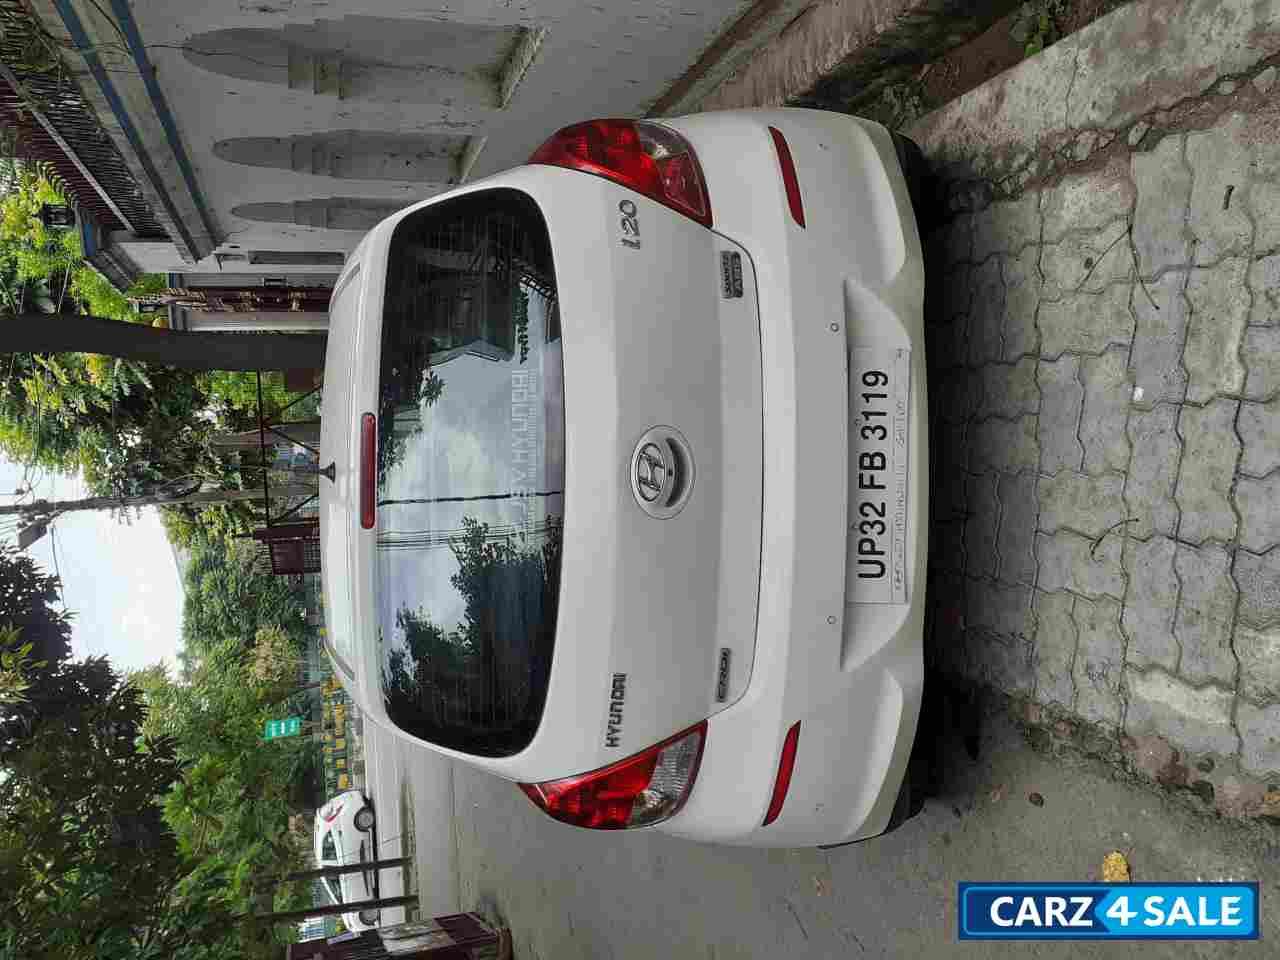 Used 2013 model Hyundai i20 Sportz 1 4 CRDi for sale in